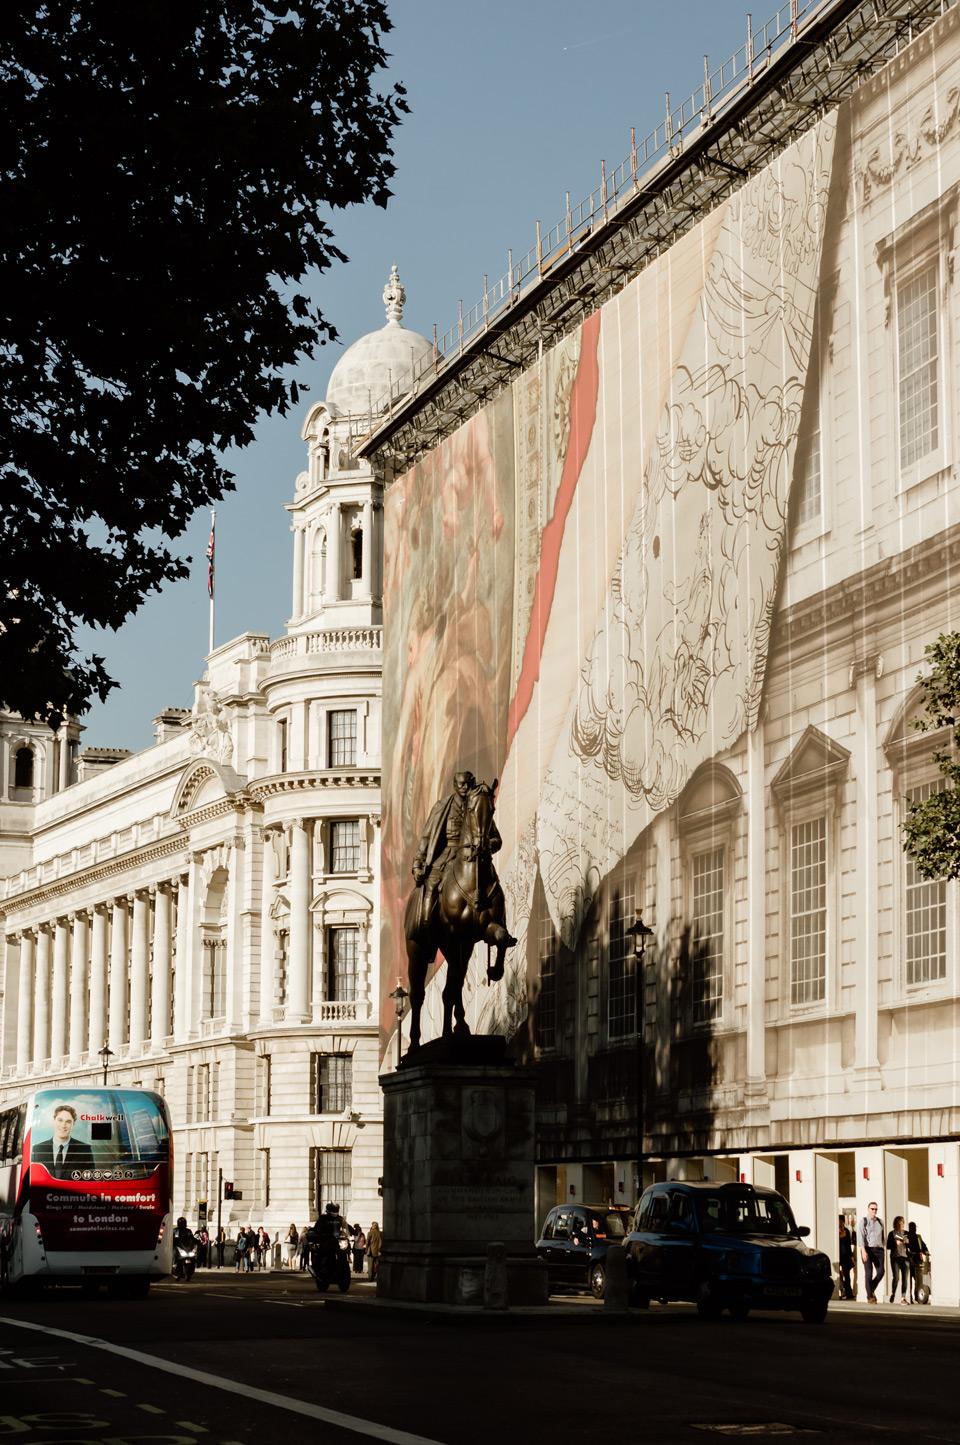 London, Whilehall street